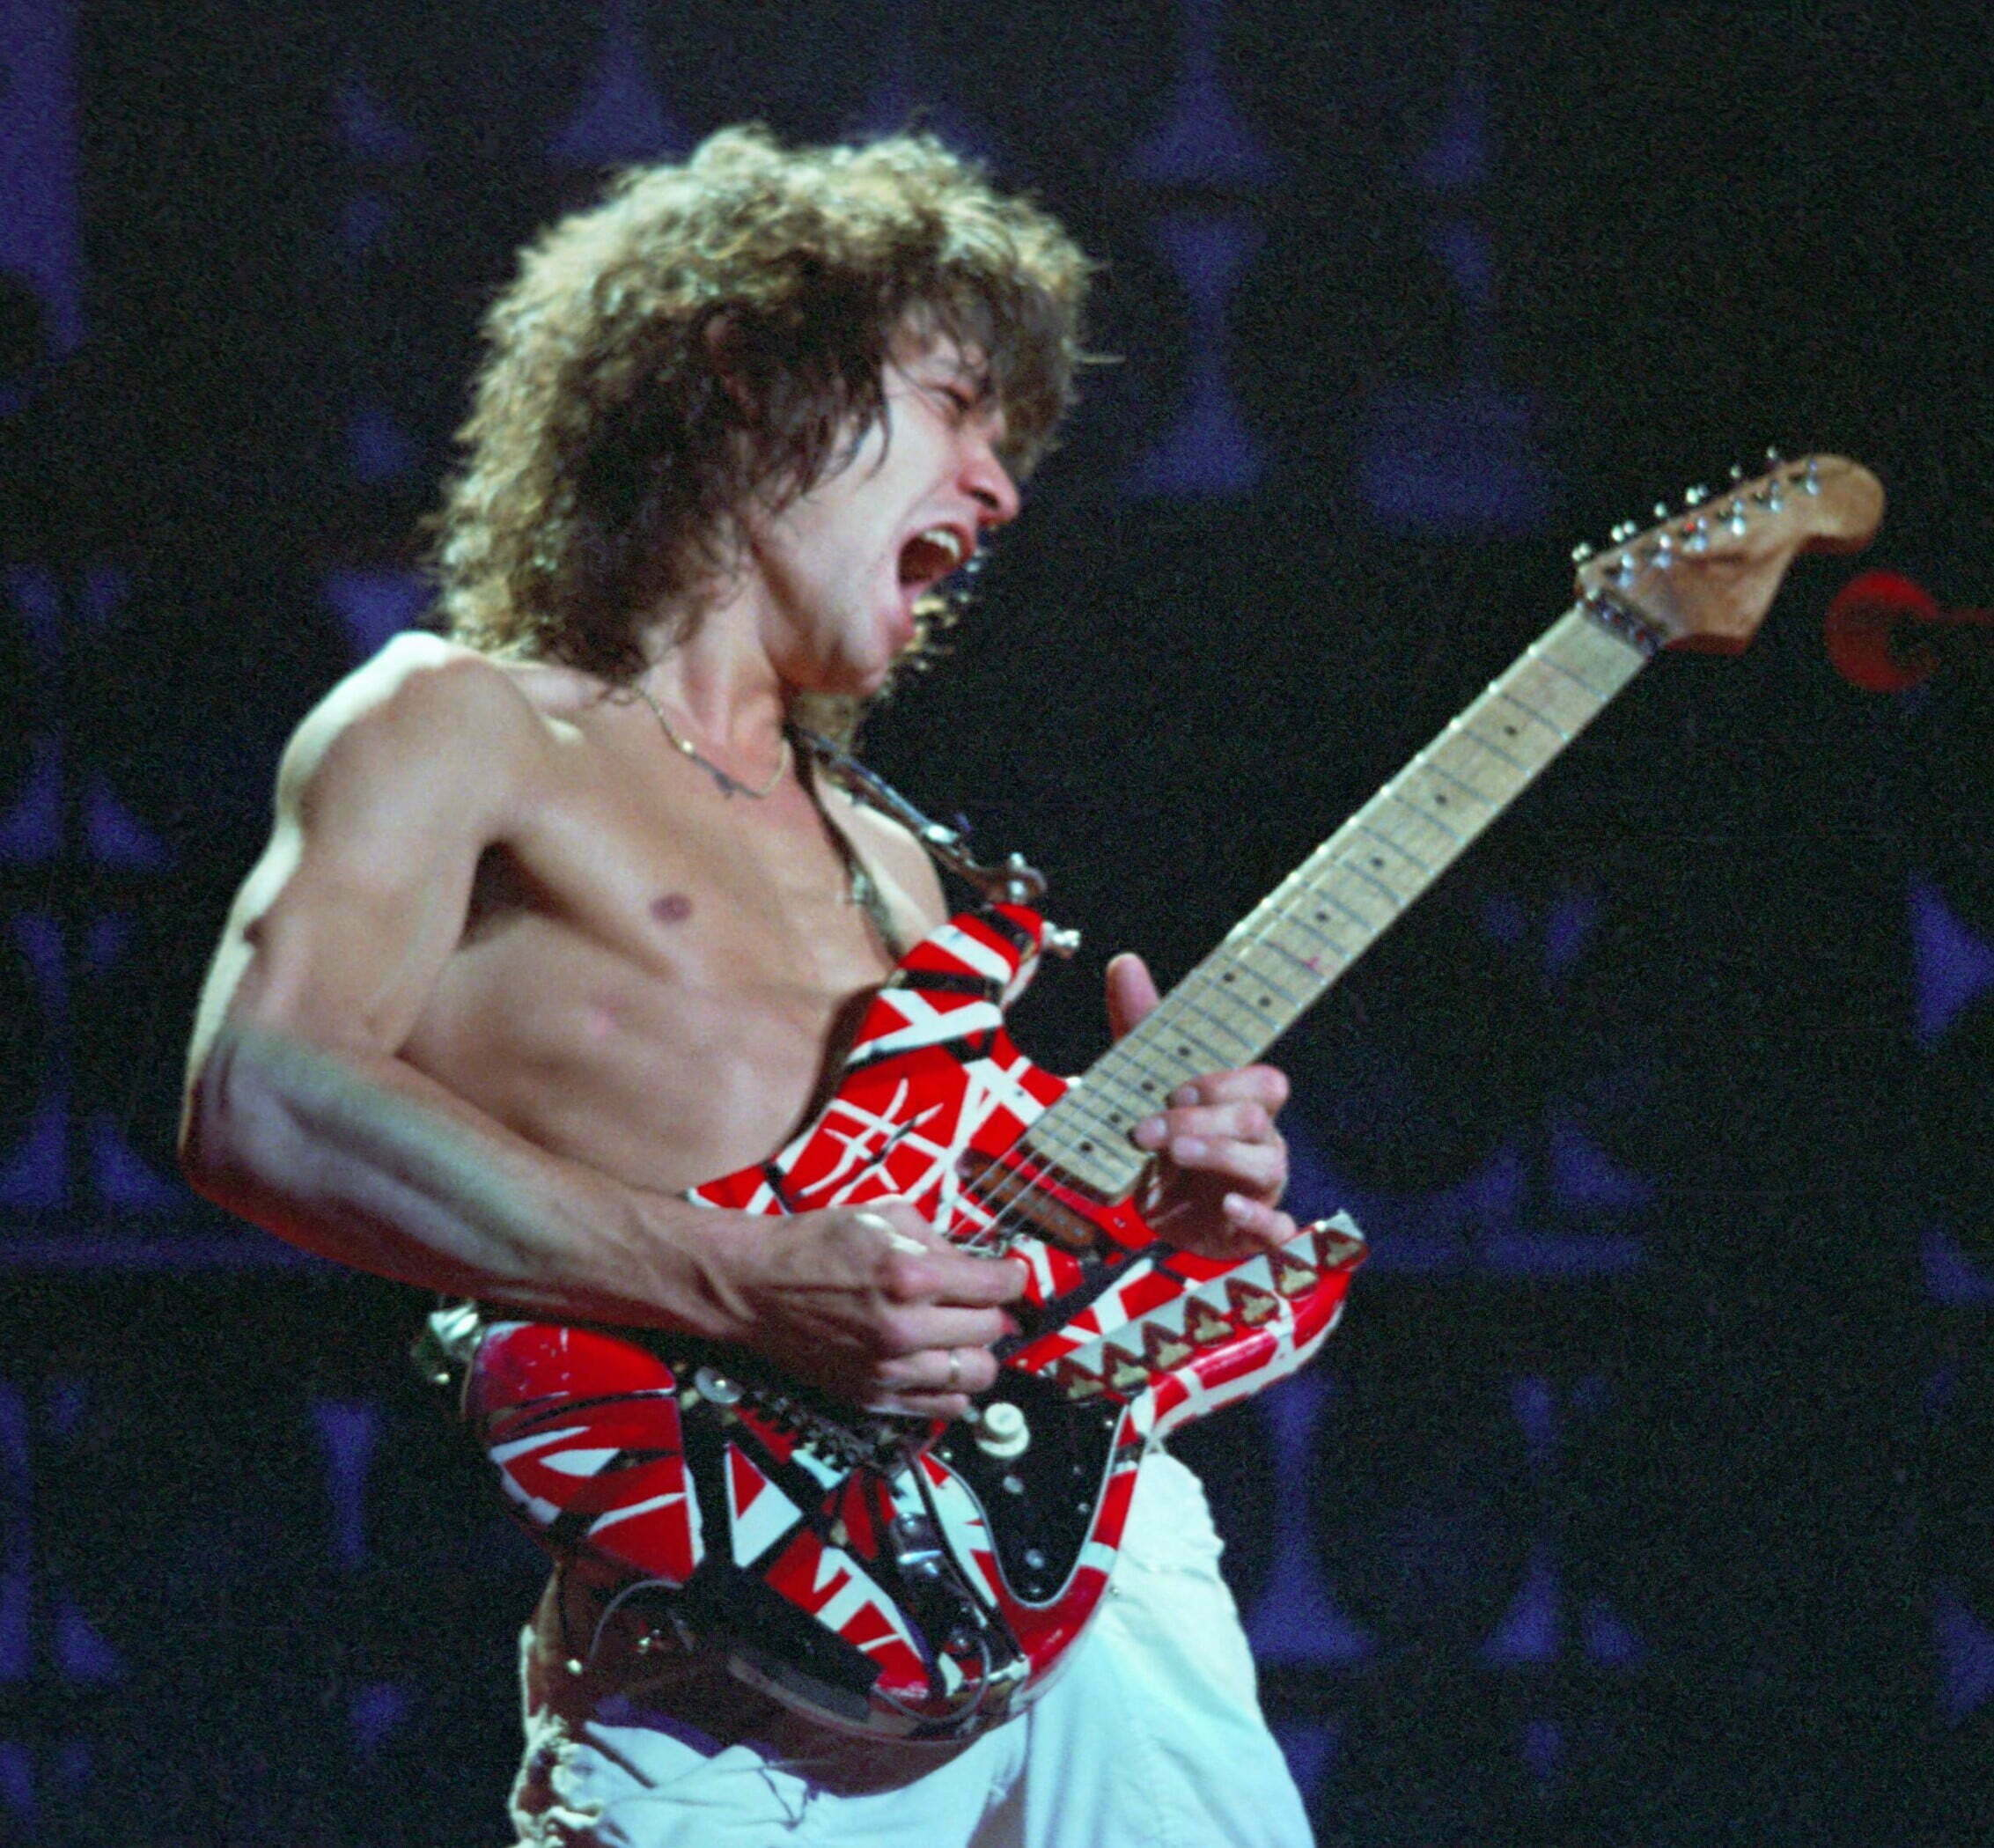 Eddie Van Halen (1955 - 2020)